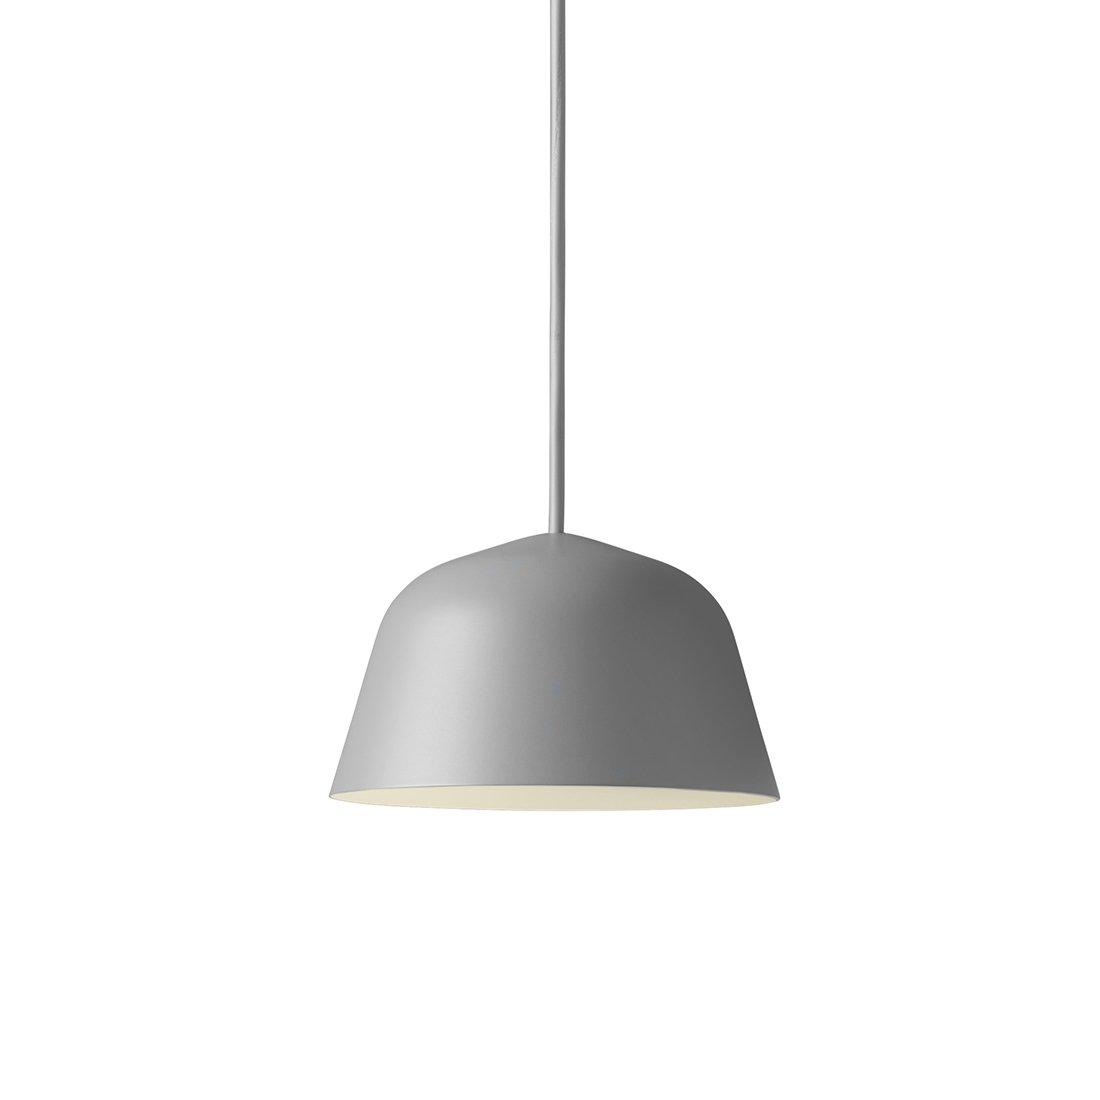 Muuto Ambit Hanglamp Ø16.5 cm.